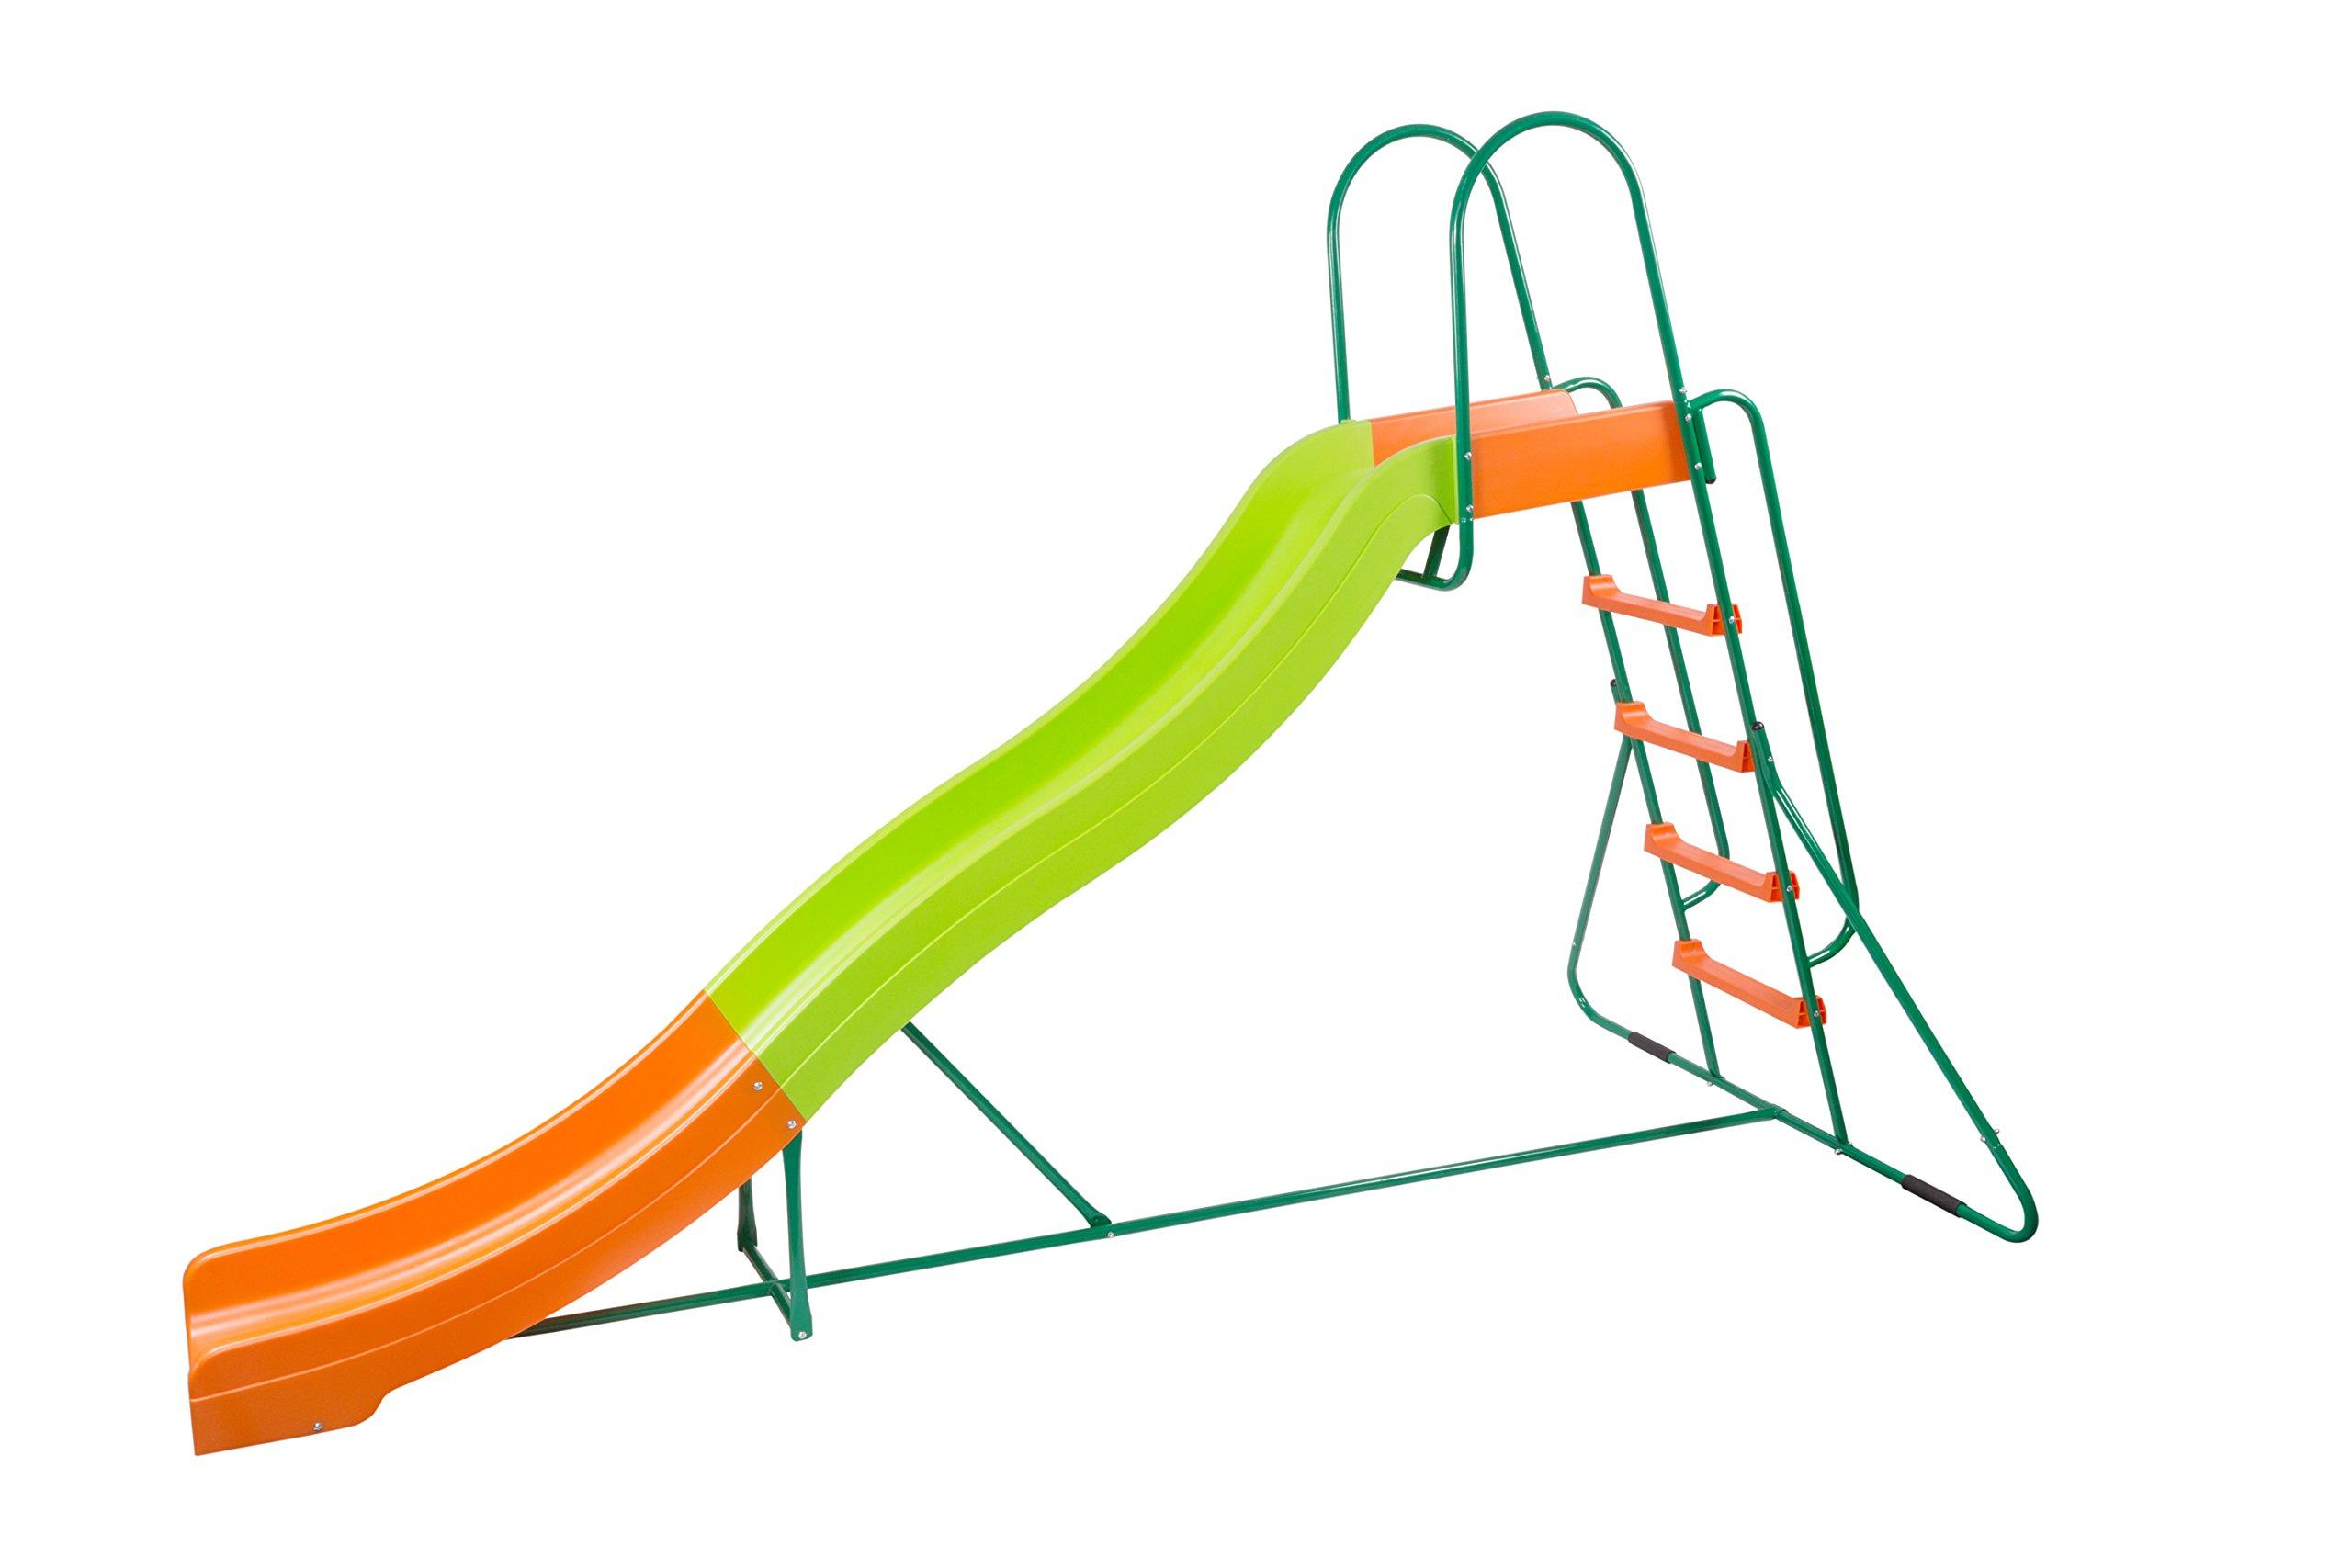 SLIDEWHIZZER Outdoor Play Set Kids Slide: 10 ft Freestanding Climber, Swingsets, Playground Jungle Gyms Kids Love - Above Ground Pool Slide for Summer Backyard by SLIDEWHIZZER (Image #9)